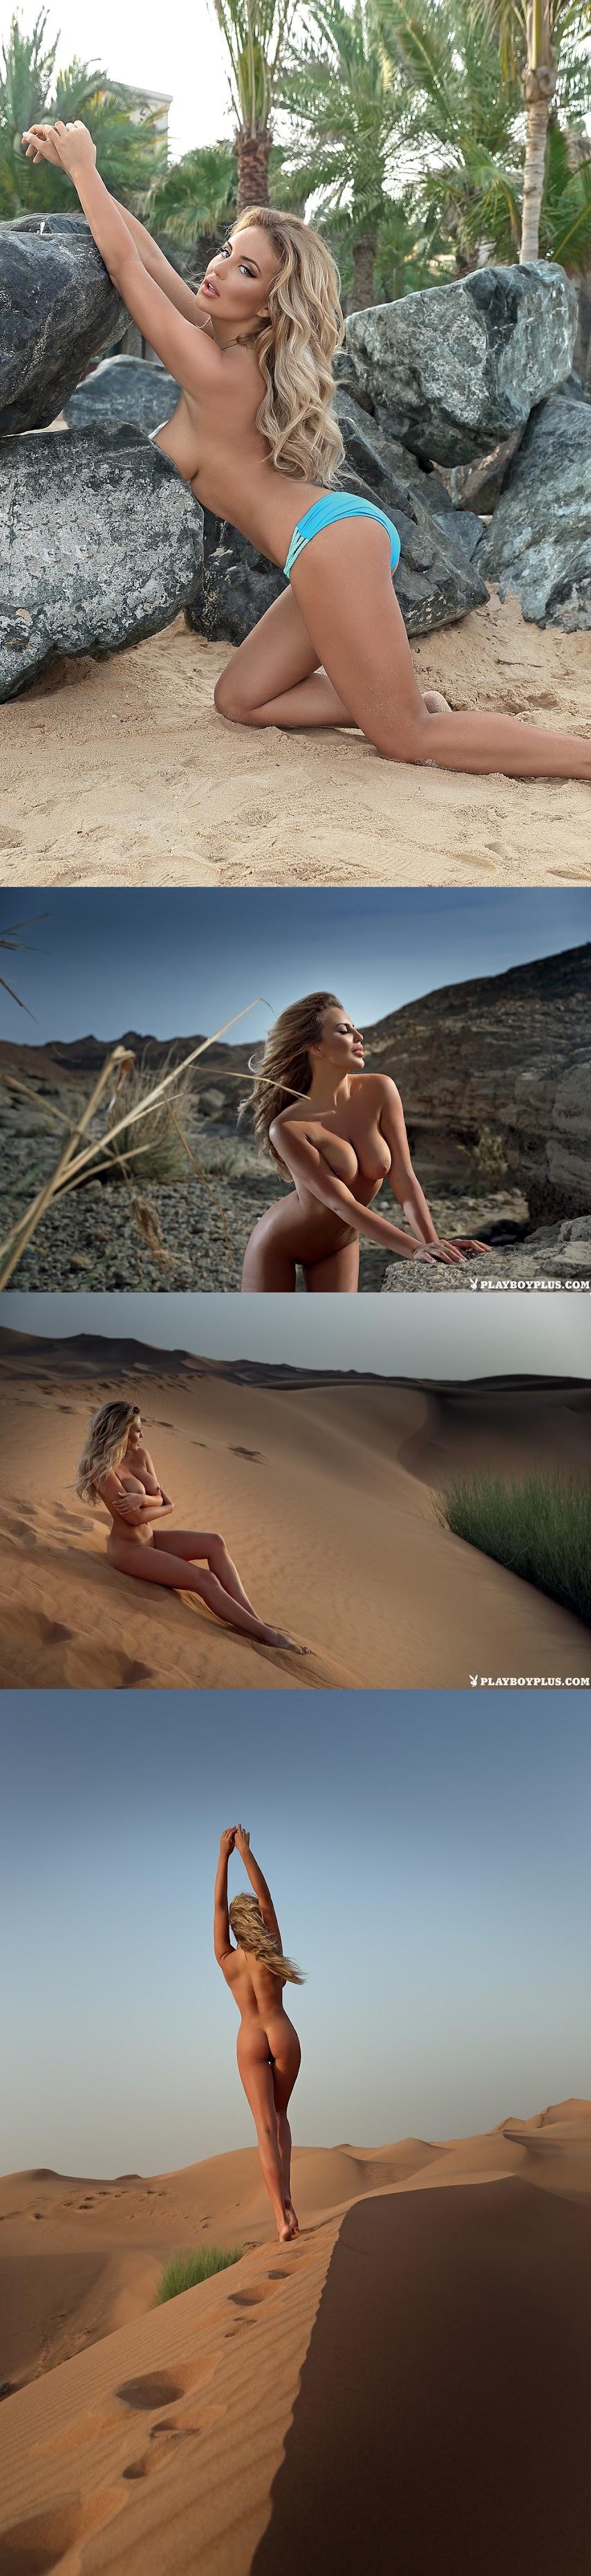 Playboy PlayboyPlus.com 17.01.21 Alina.Ilyina.Playboy.Ukraine sexy girls image jav